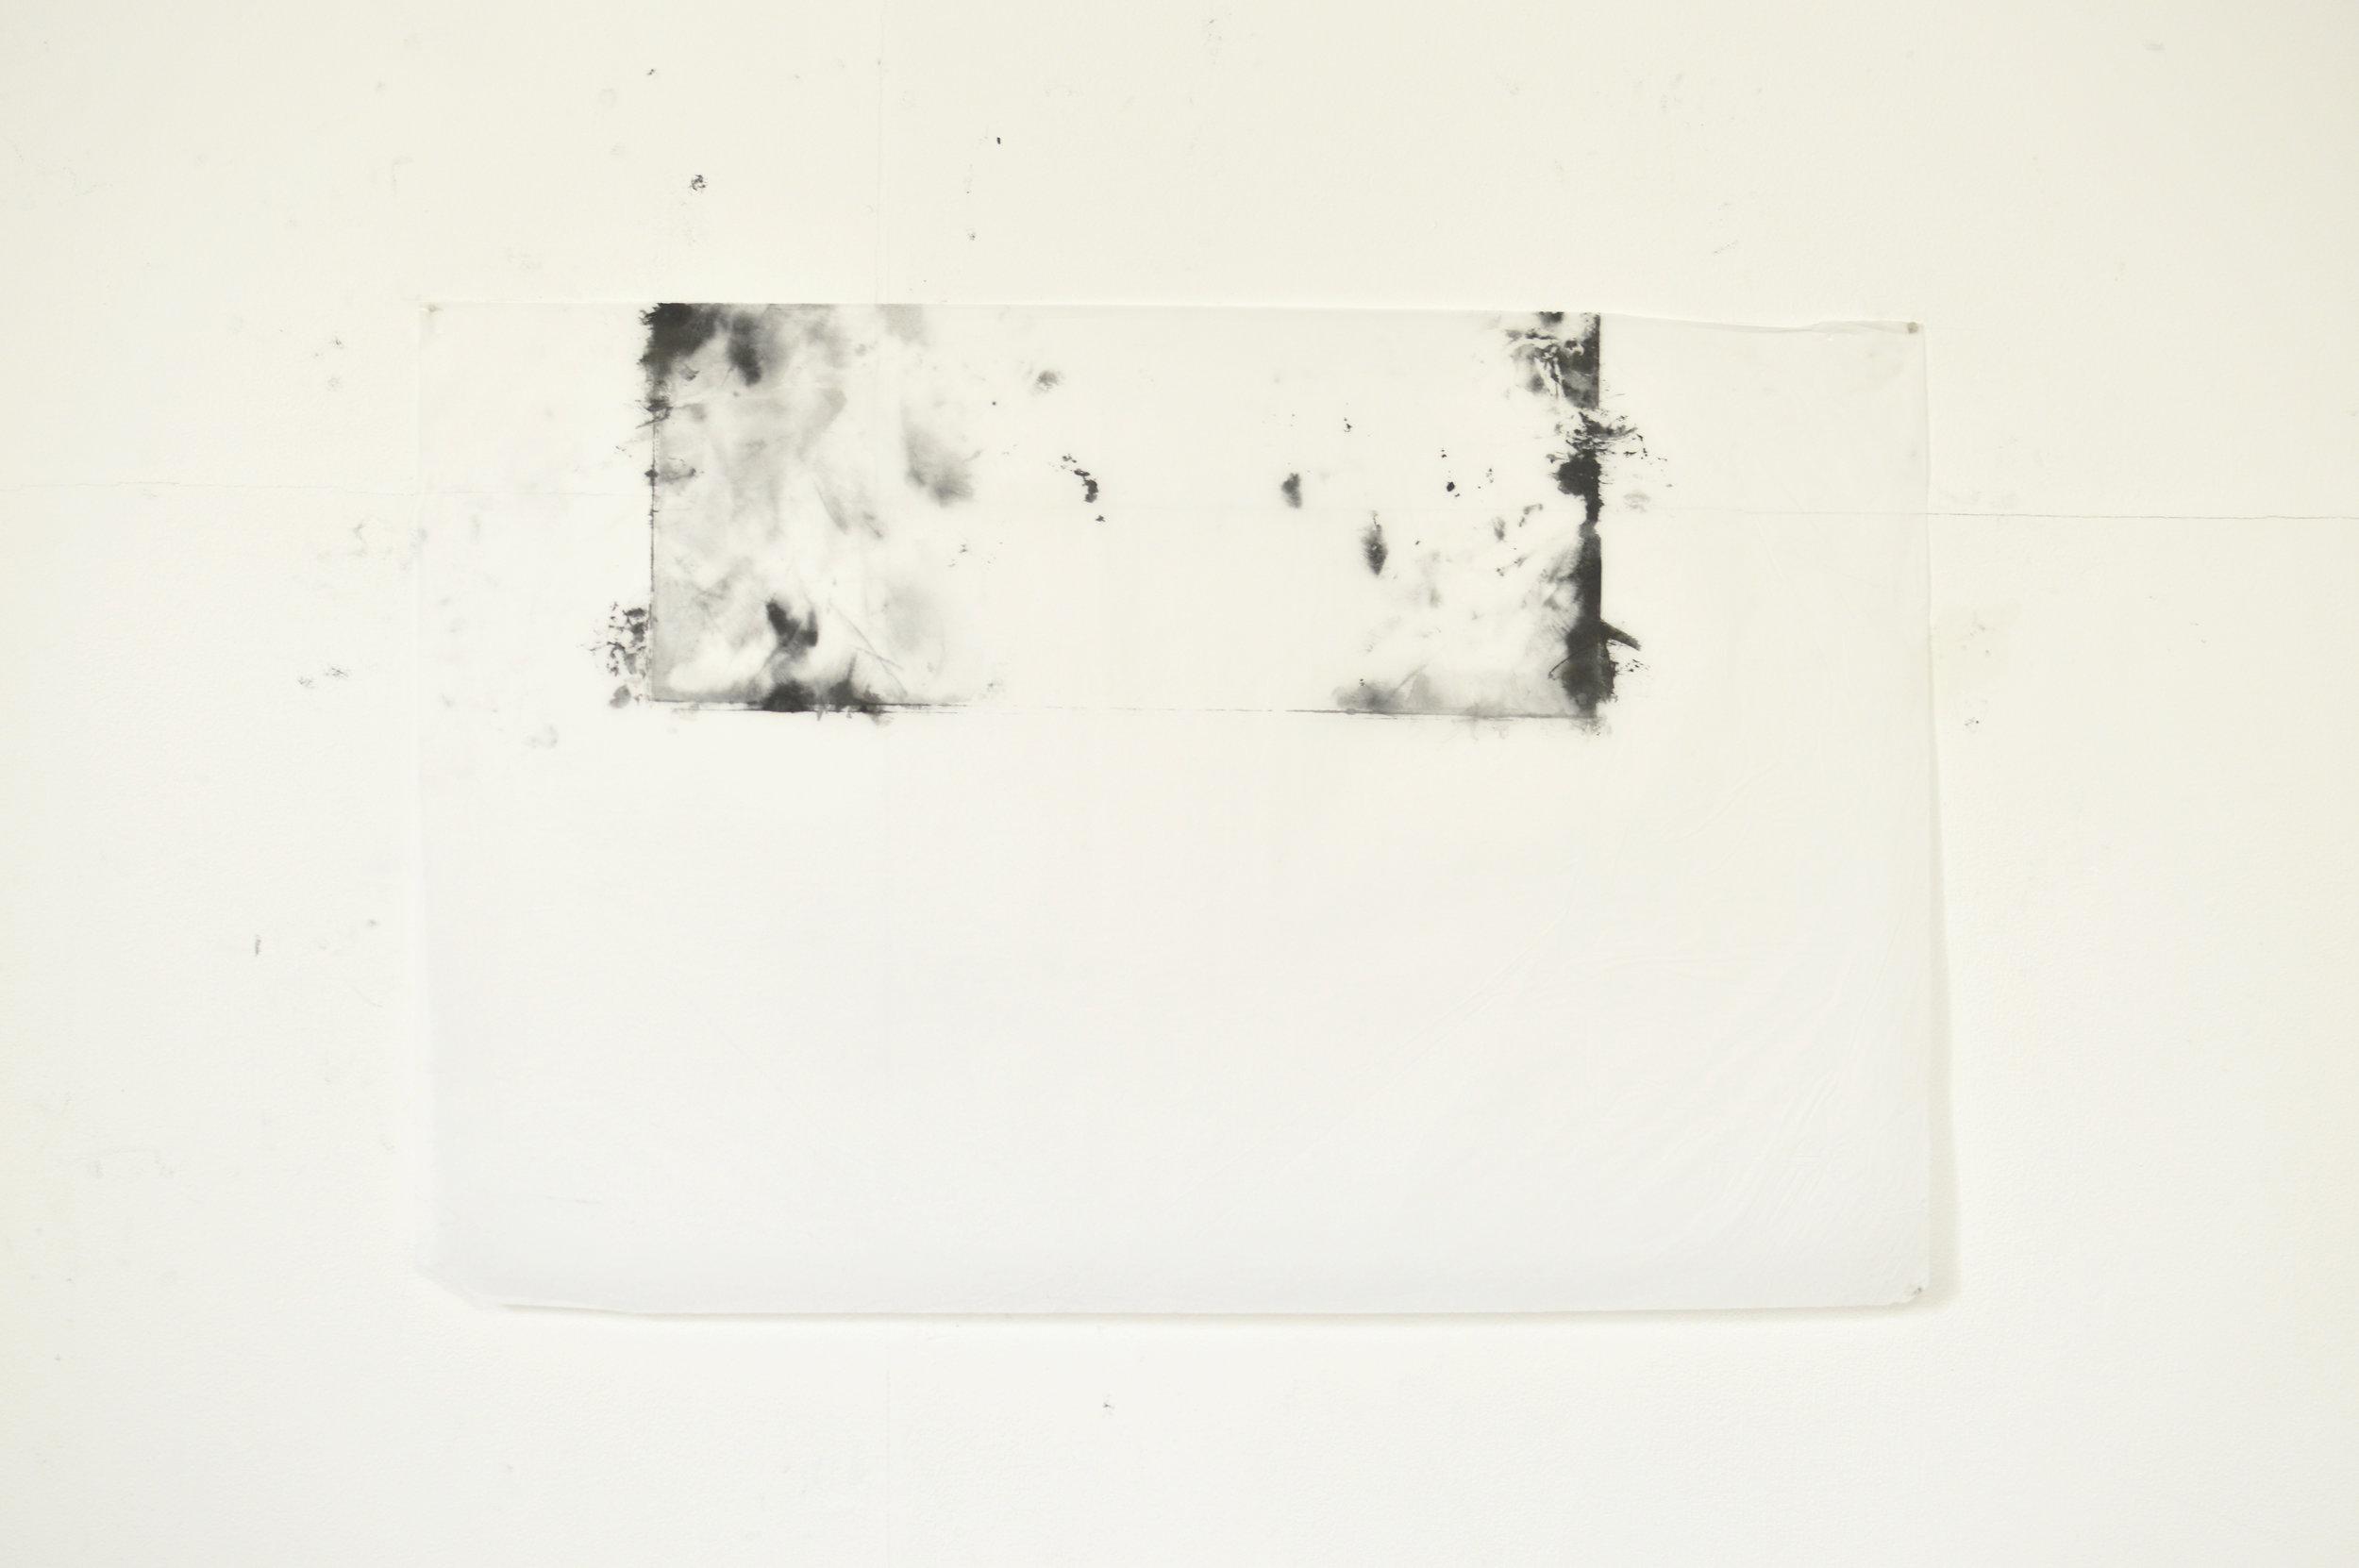 Tissue paper, pigment, copperplate oil, white spirit  75cm x 49cm